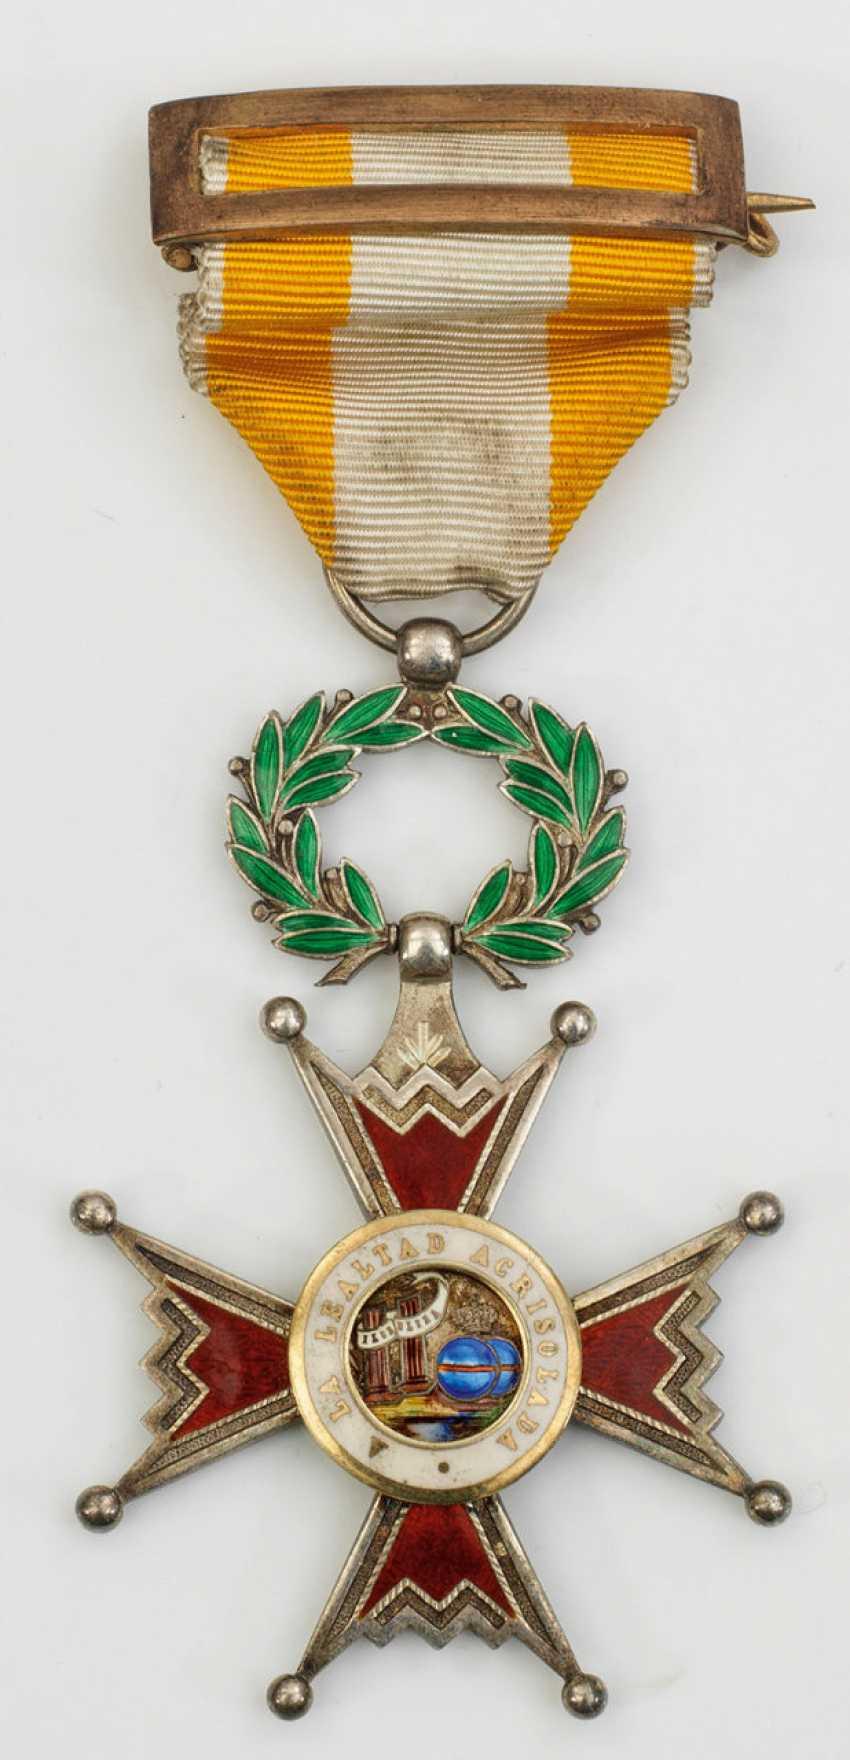 Silberkreuz des Orden de Isabel la Católica - photo 1